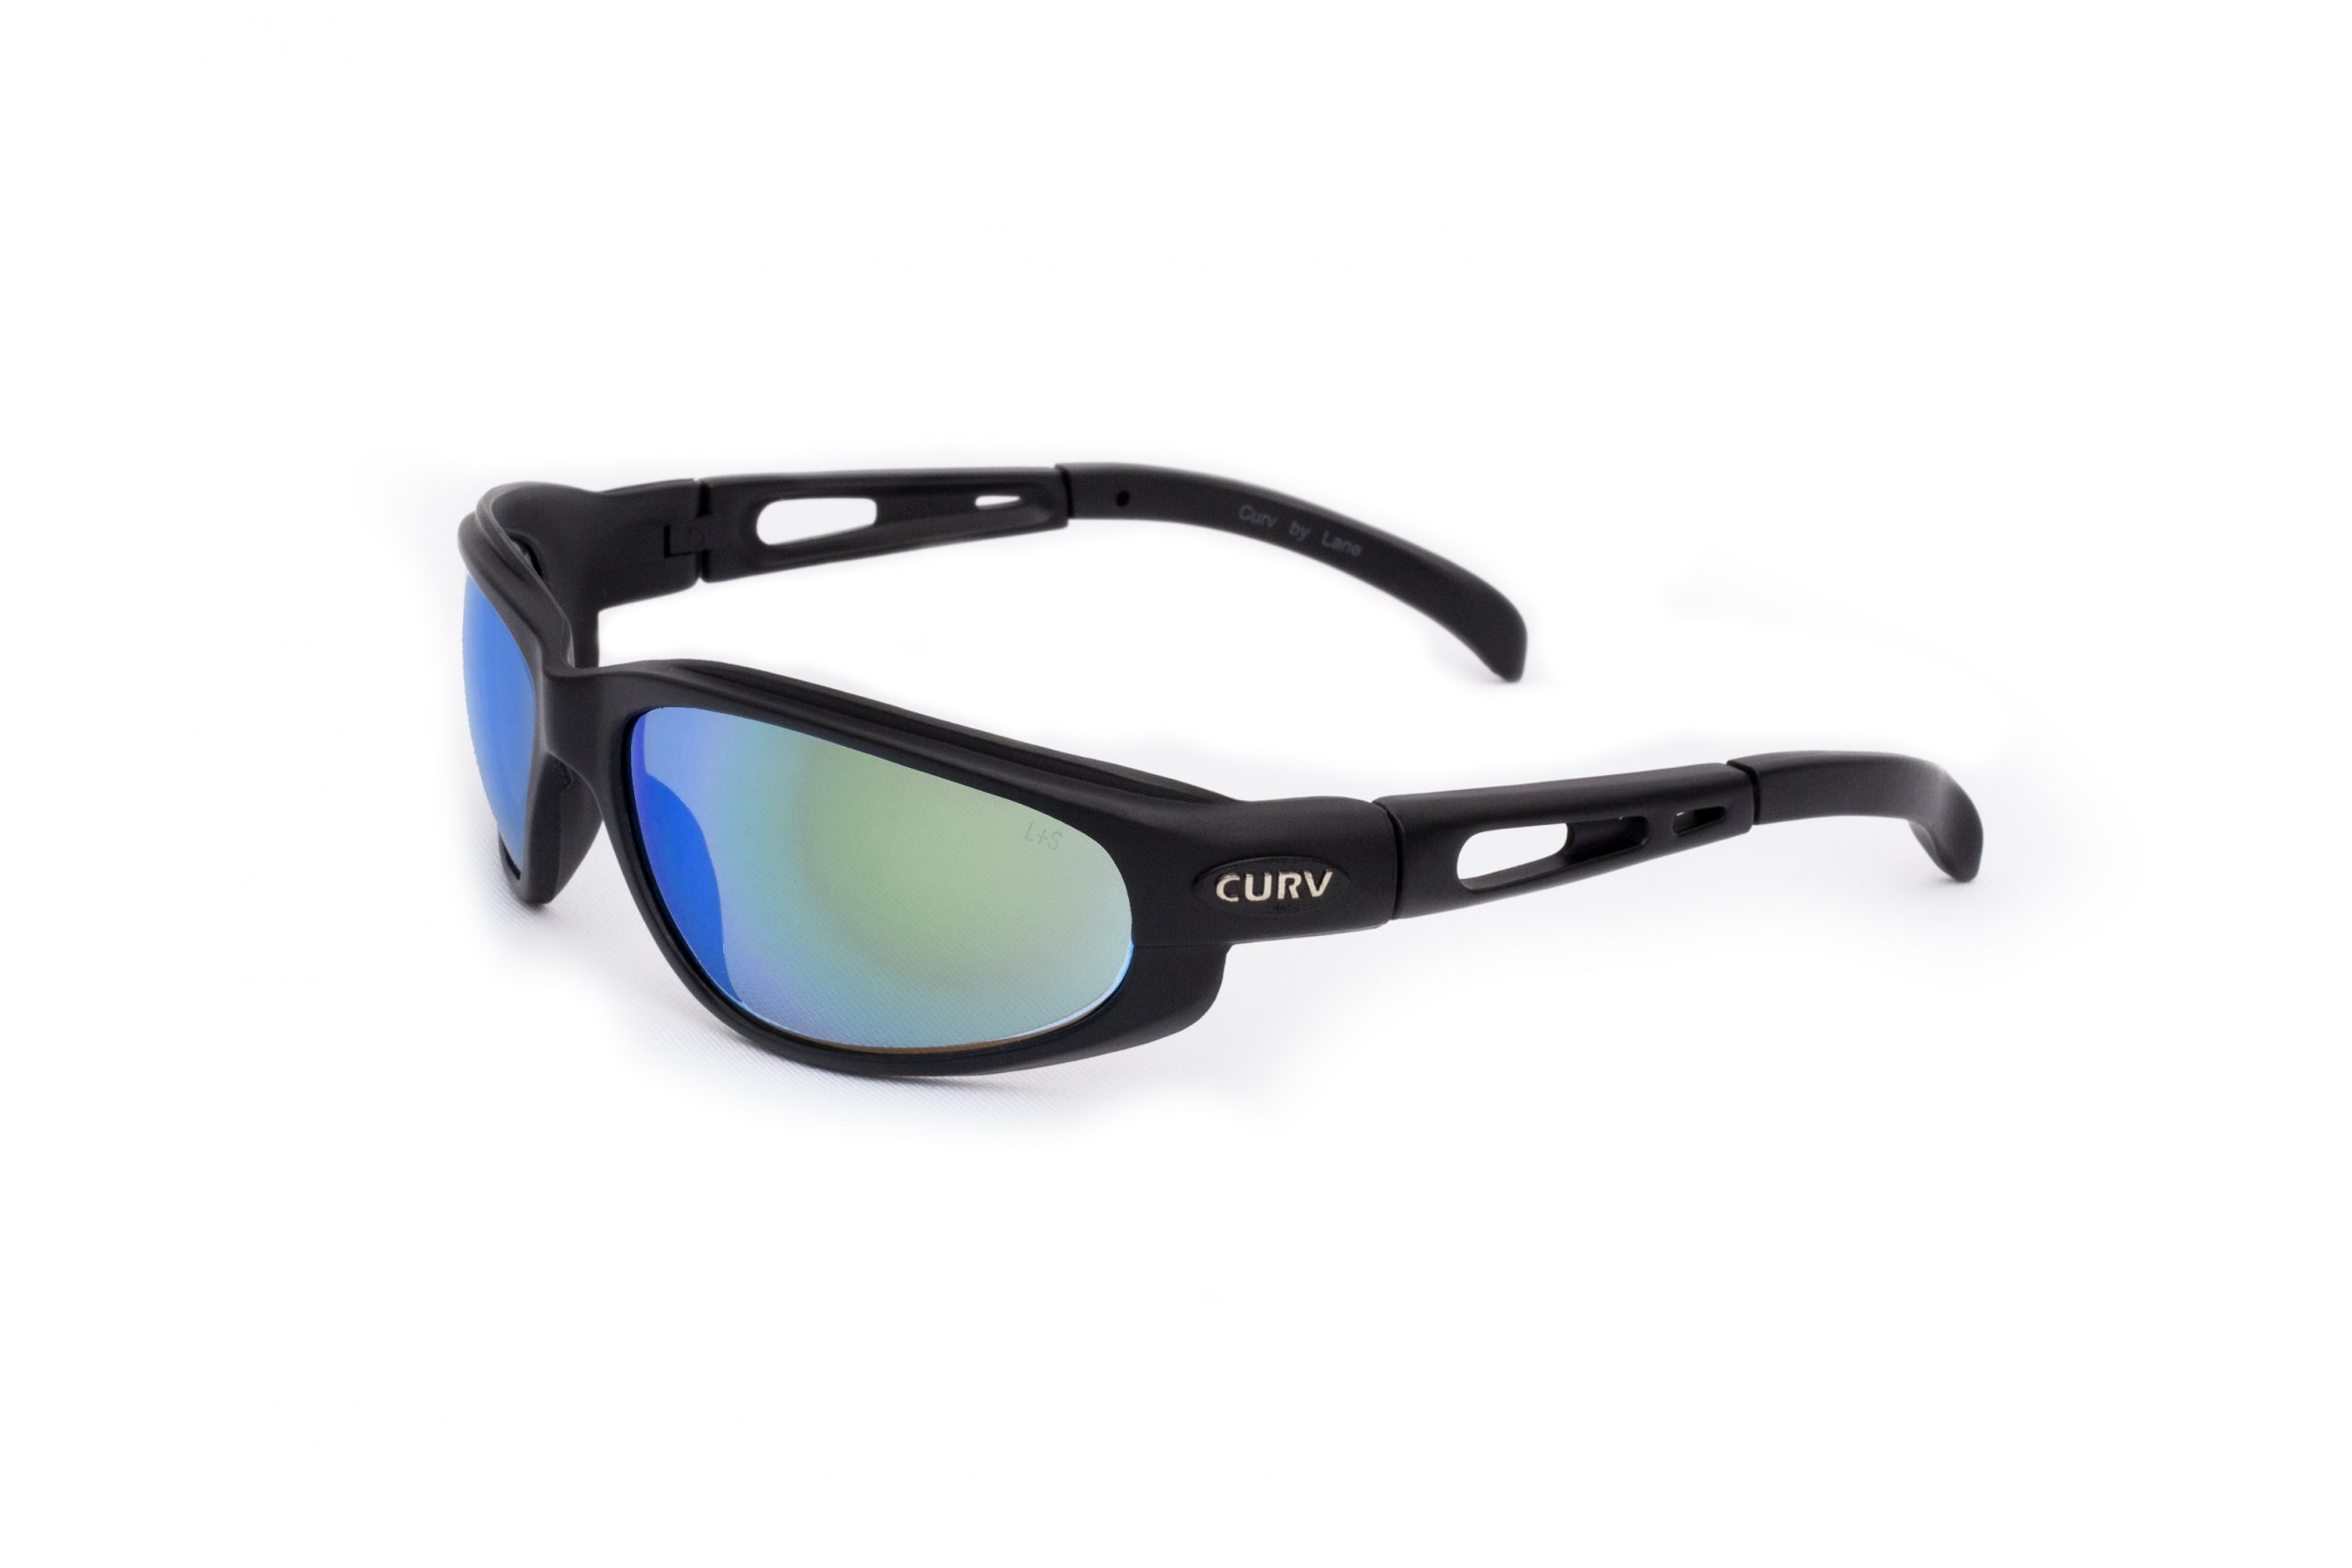 01-12 Curv Blue Mirror Sunglasses